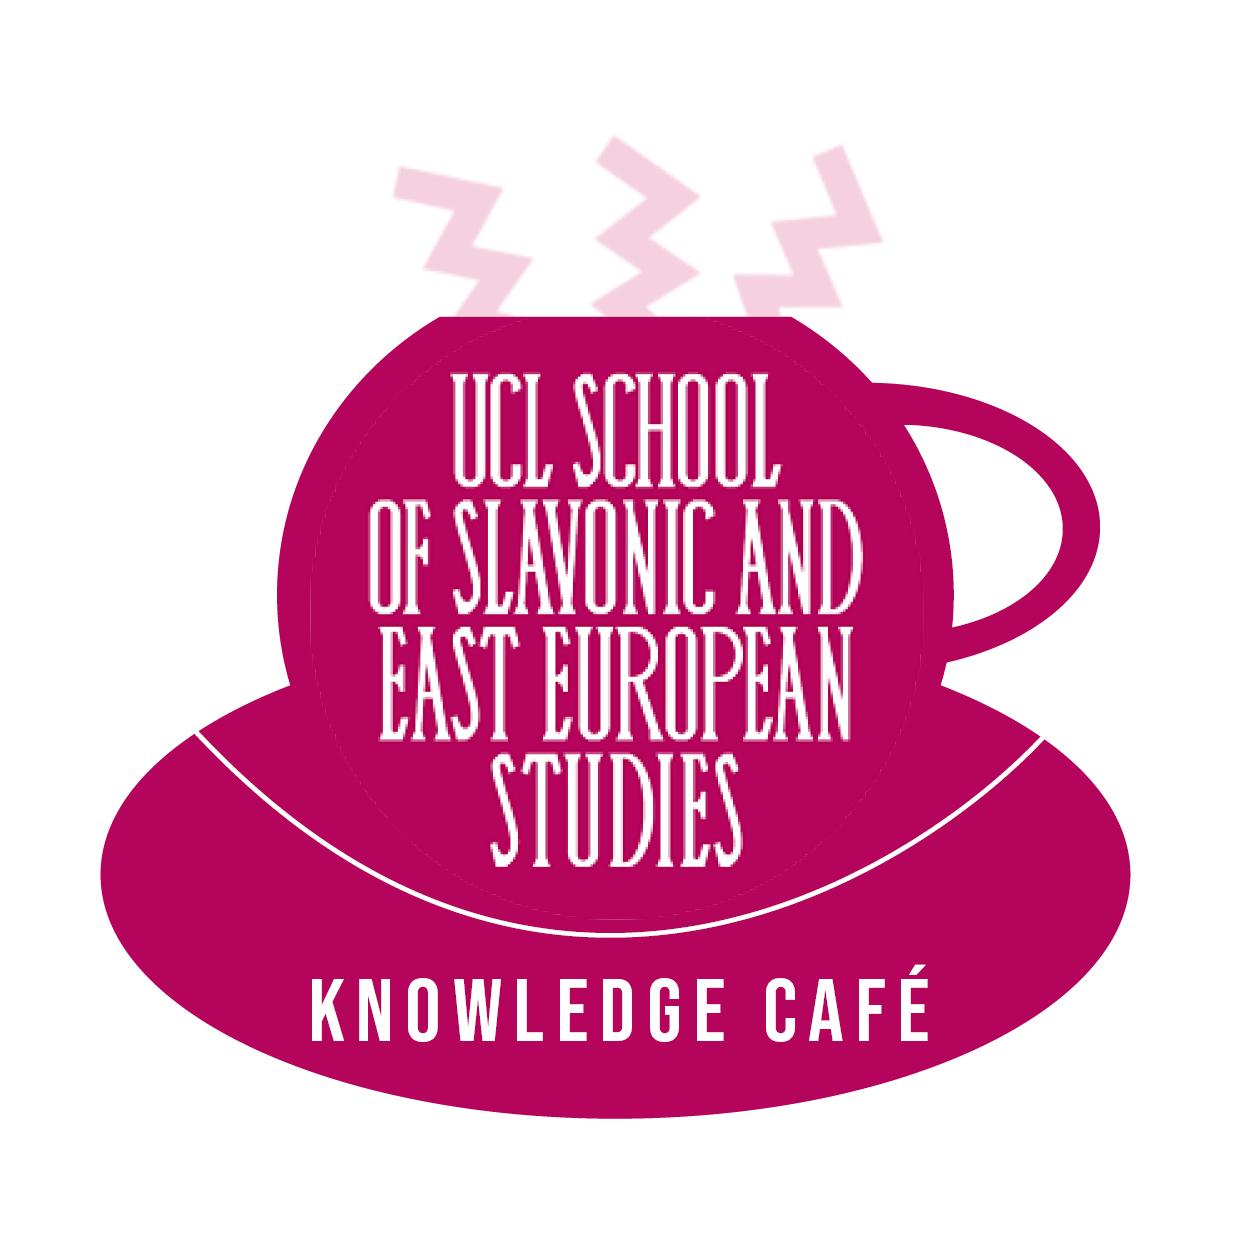 Knowledge Cafe logo